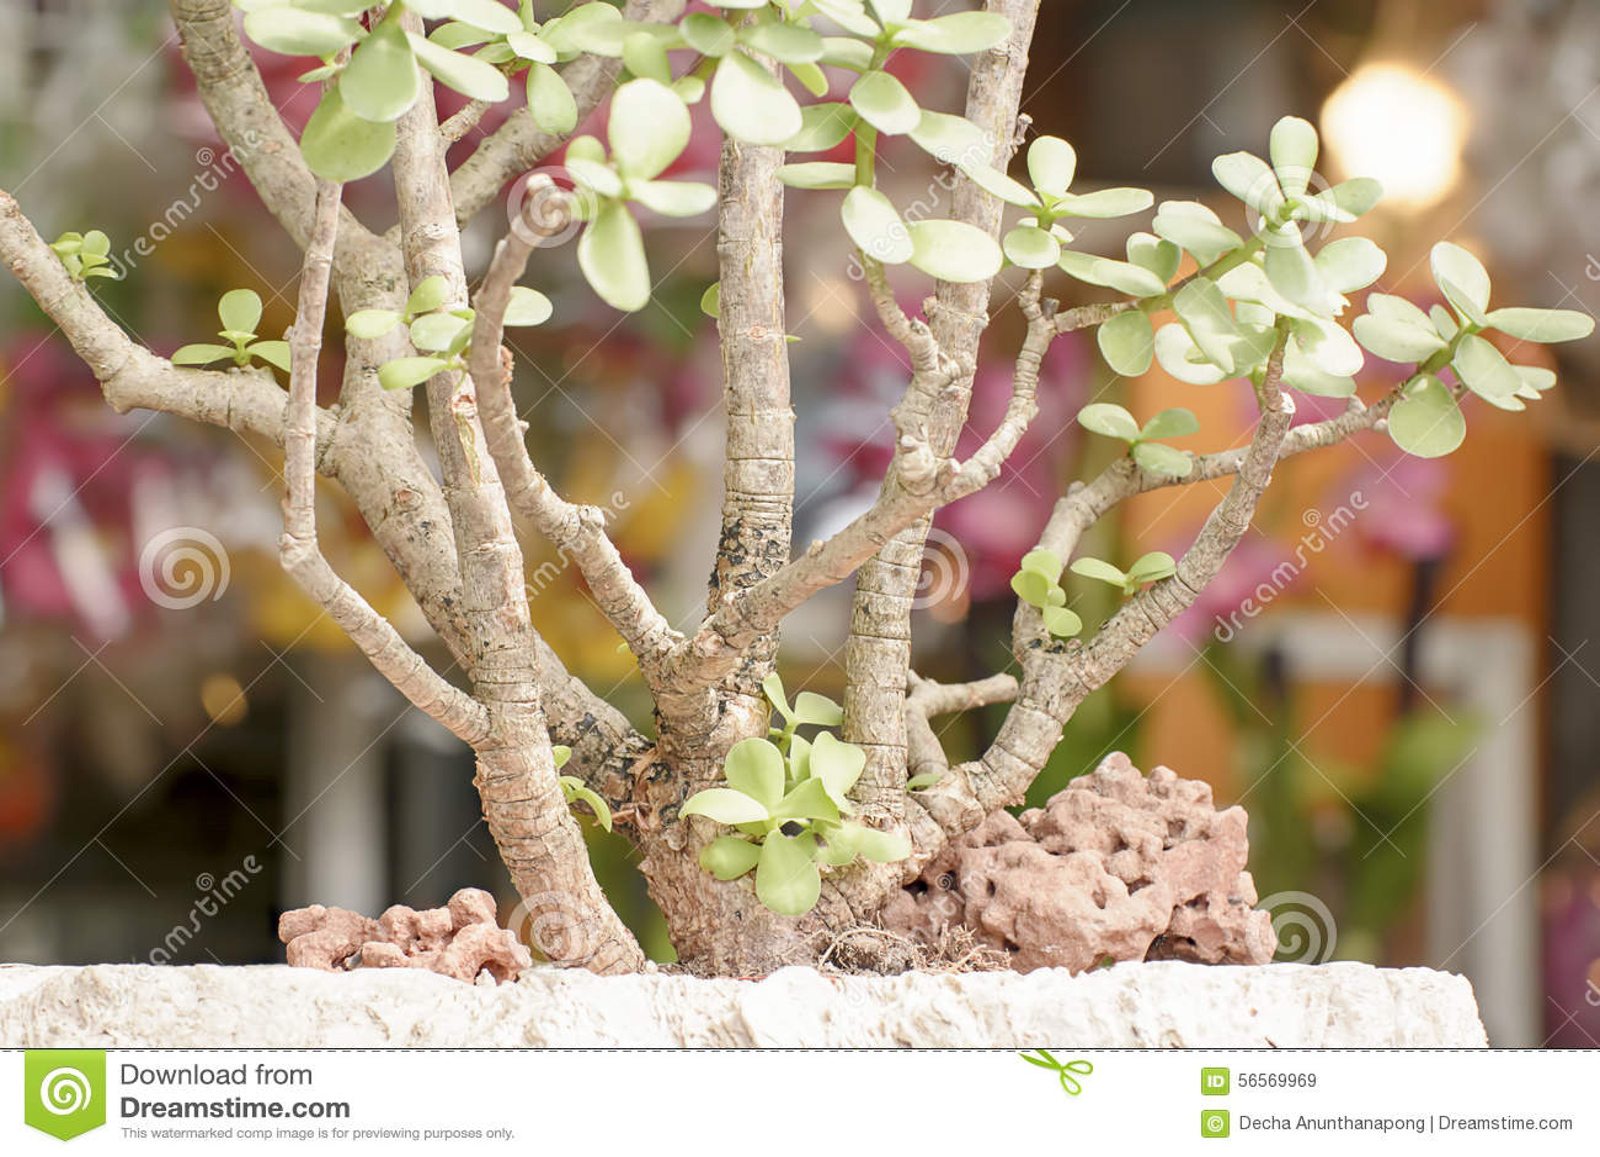 Download Η κάμψη δέντρων ή Tako της Ebony είναι το δέντρο που είναι συχνά στην κάμψη ή τον κήπο Décor Στοκ Εικόνα - εικόνα από κήπος, ebony: 56569969